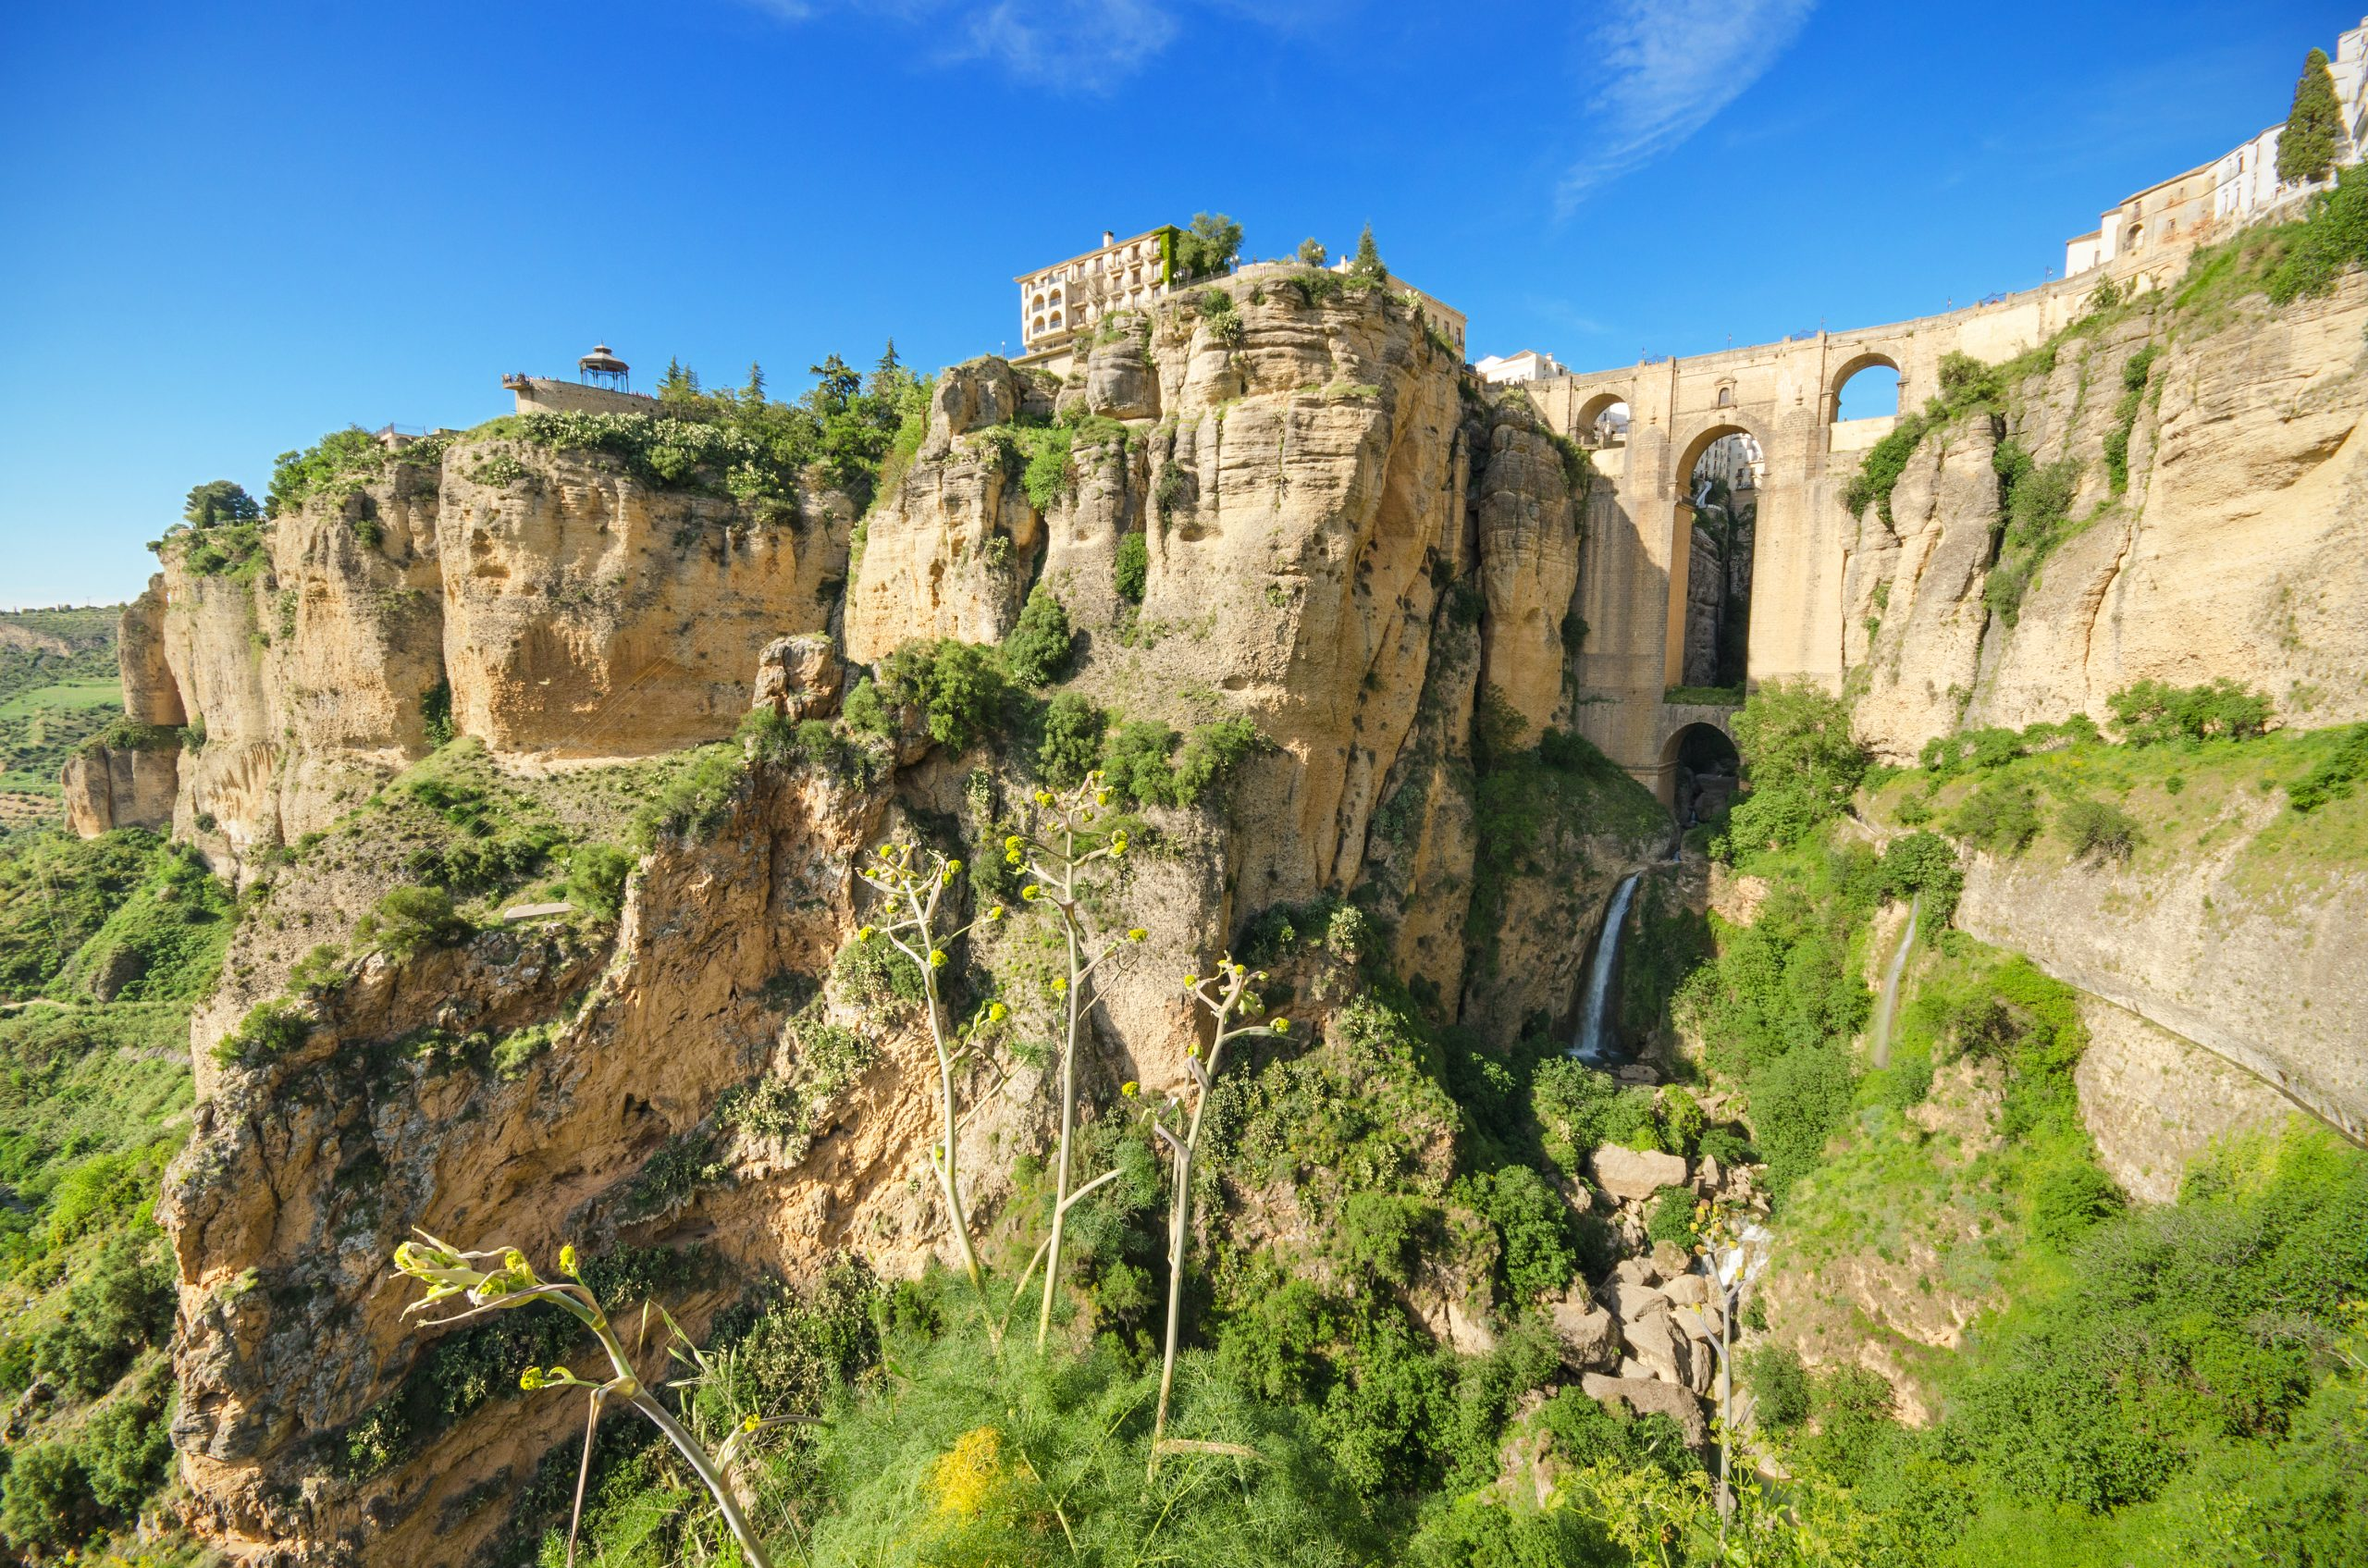 Best views of the New Bridge Ronda on a daytrip